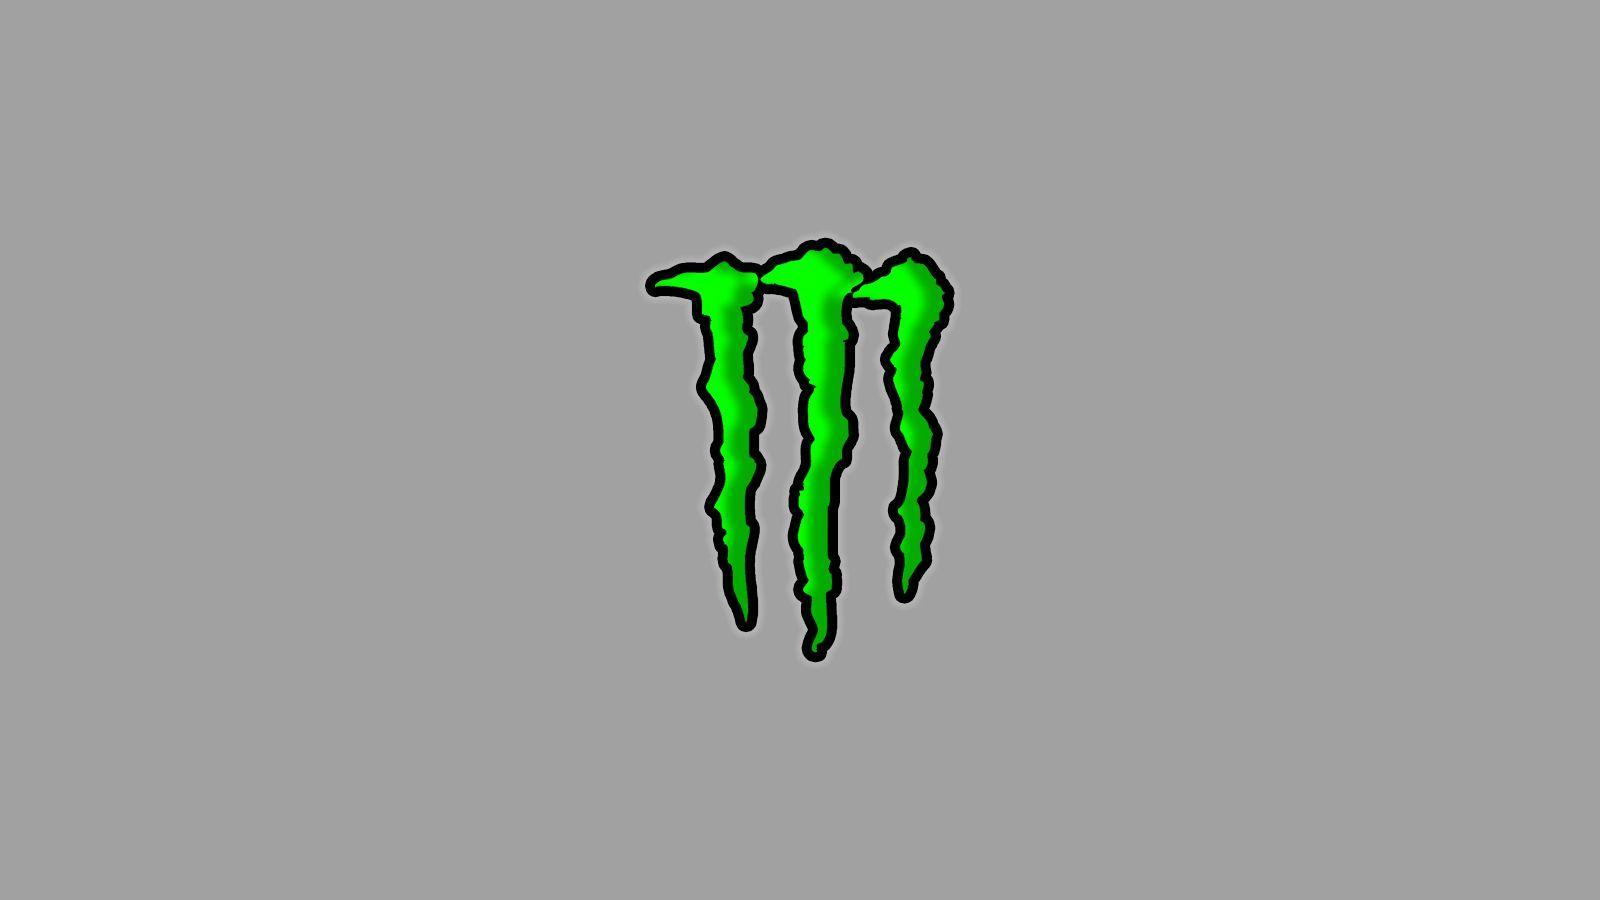 Monster Energy Wallpapers Archives - HDWallSource.com ...